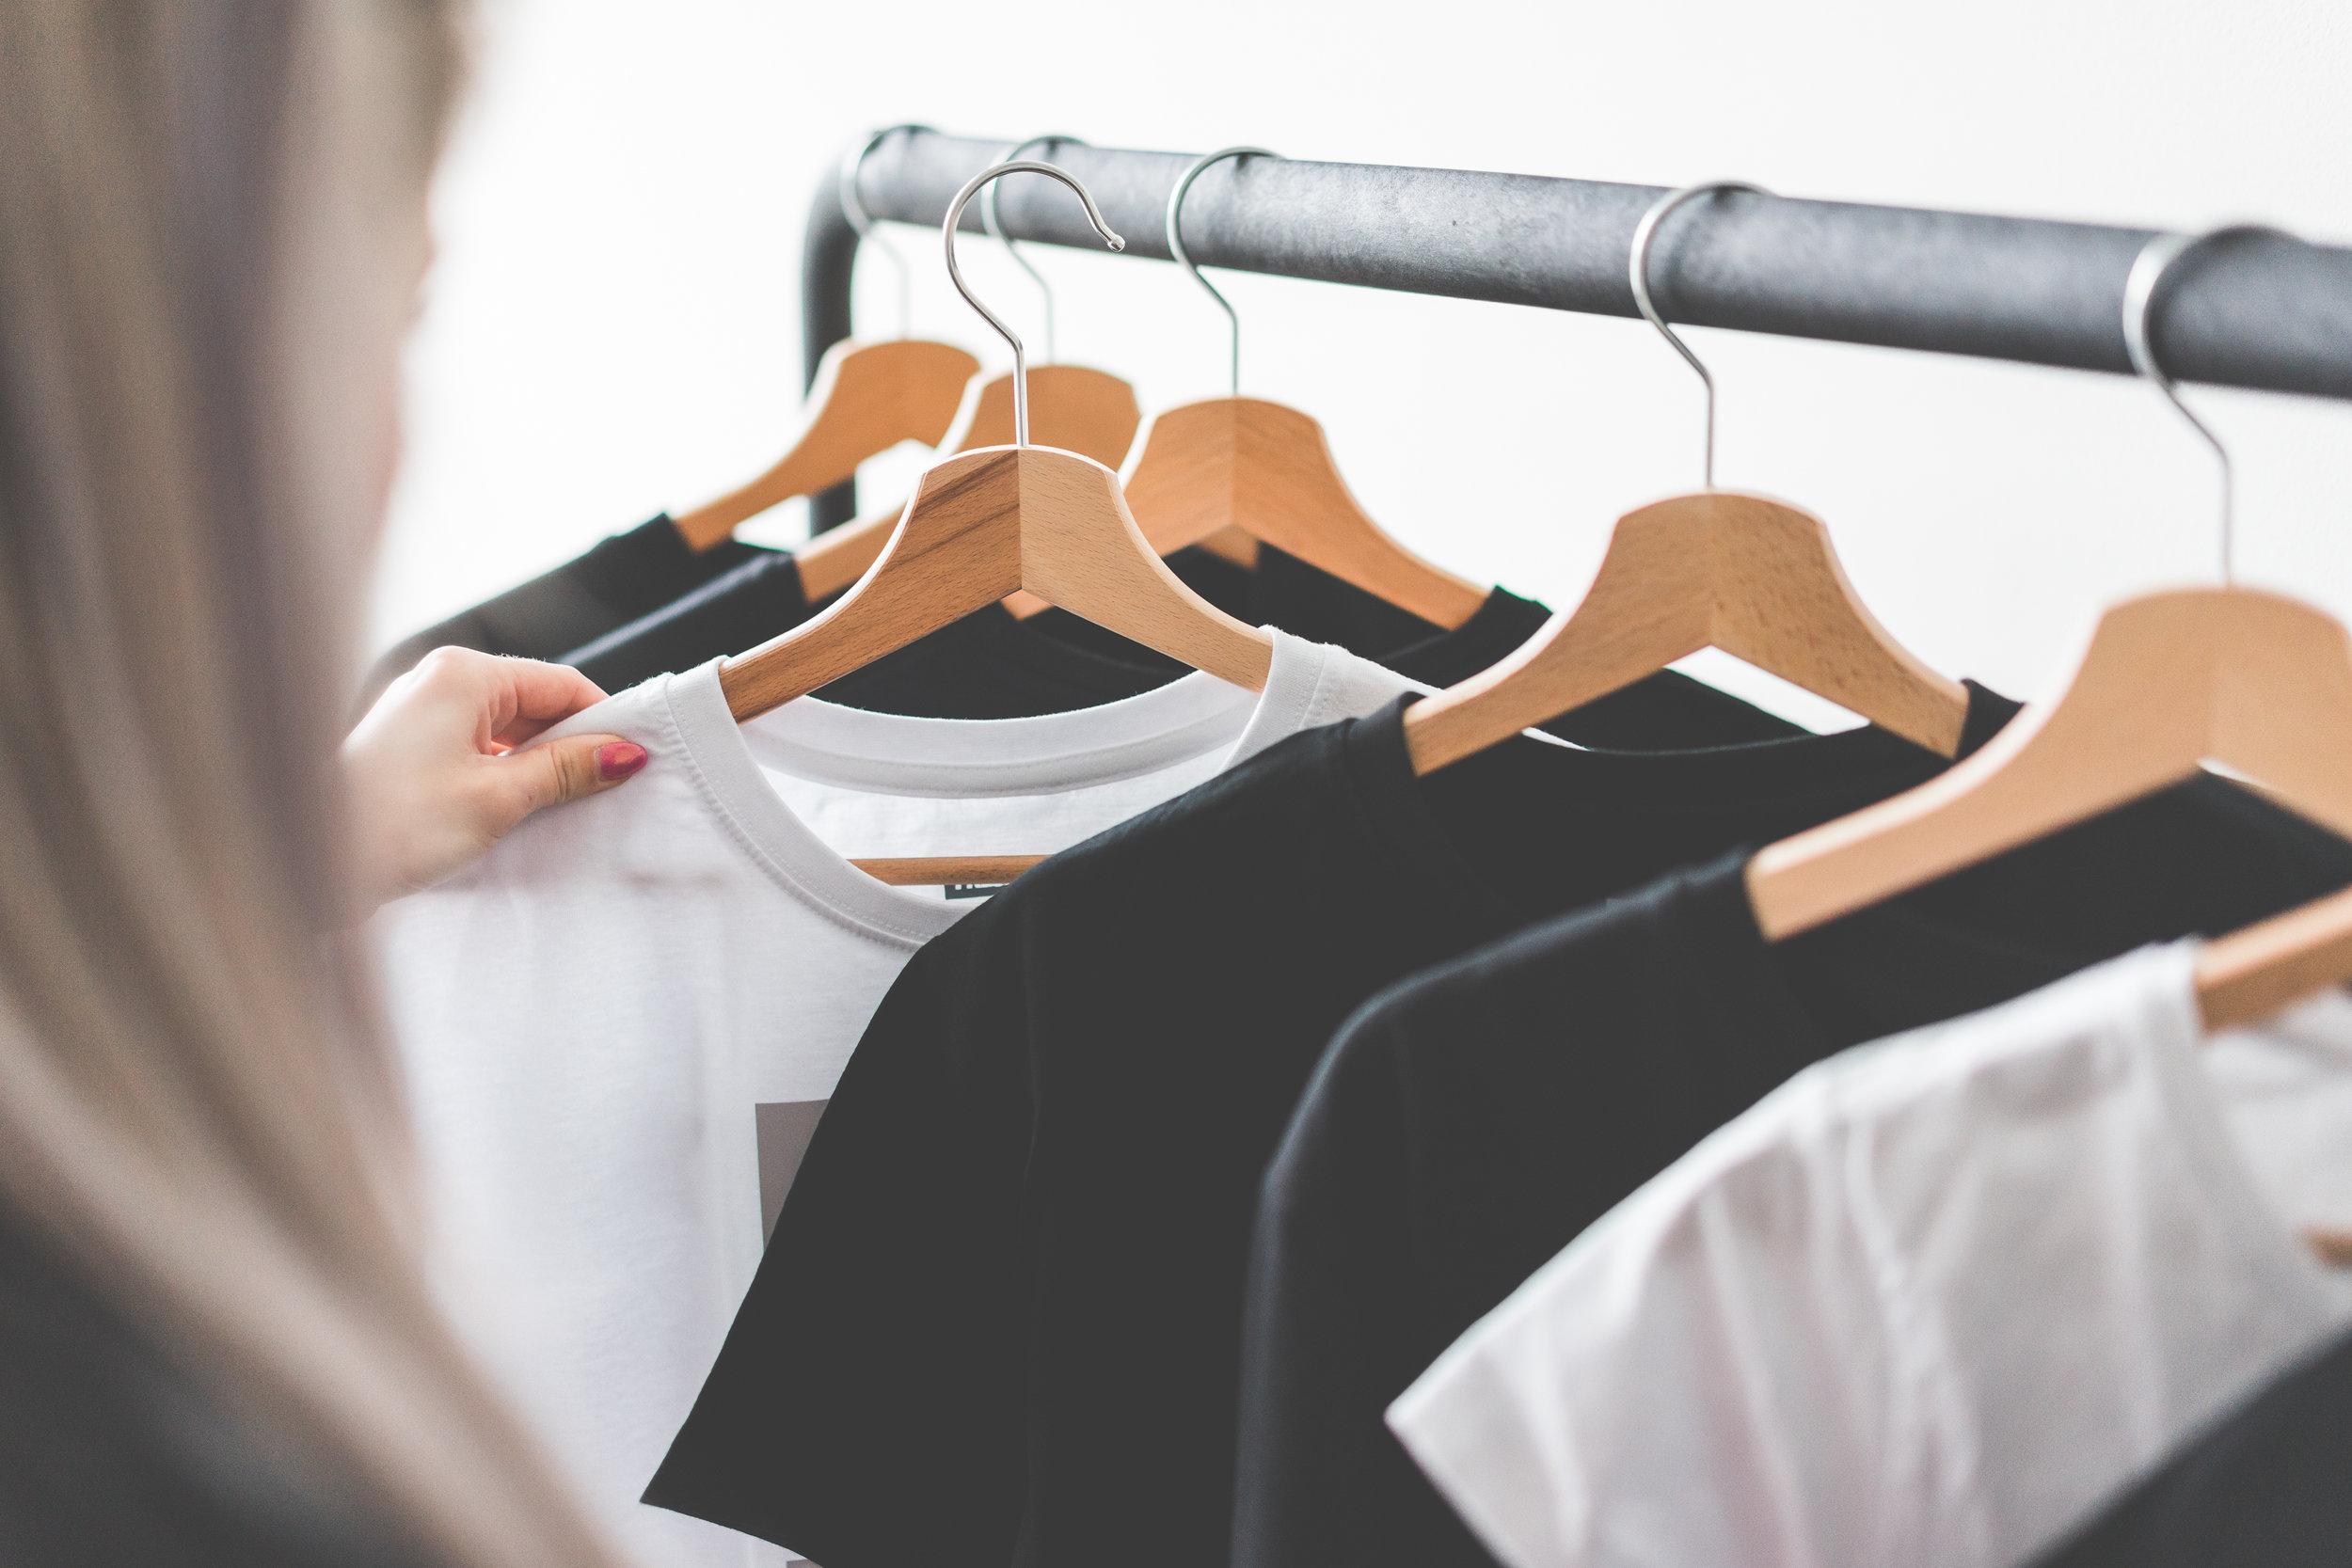 clothing-woman-choosing-t-shirts-during-clothing-shopping-at-apparel-store-picjumbo-com.jpg